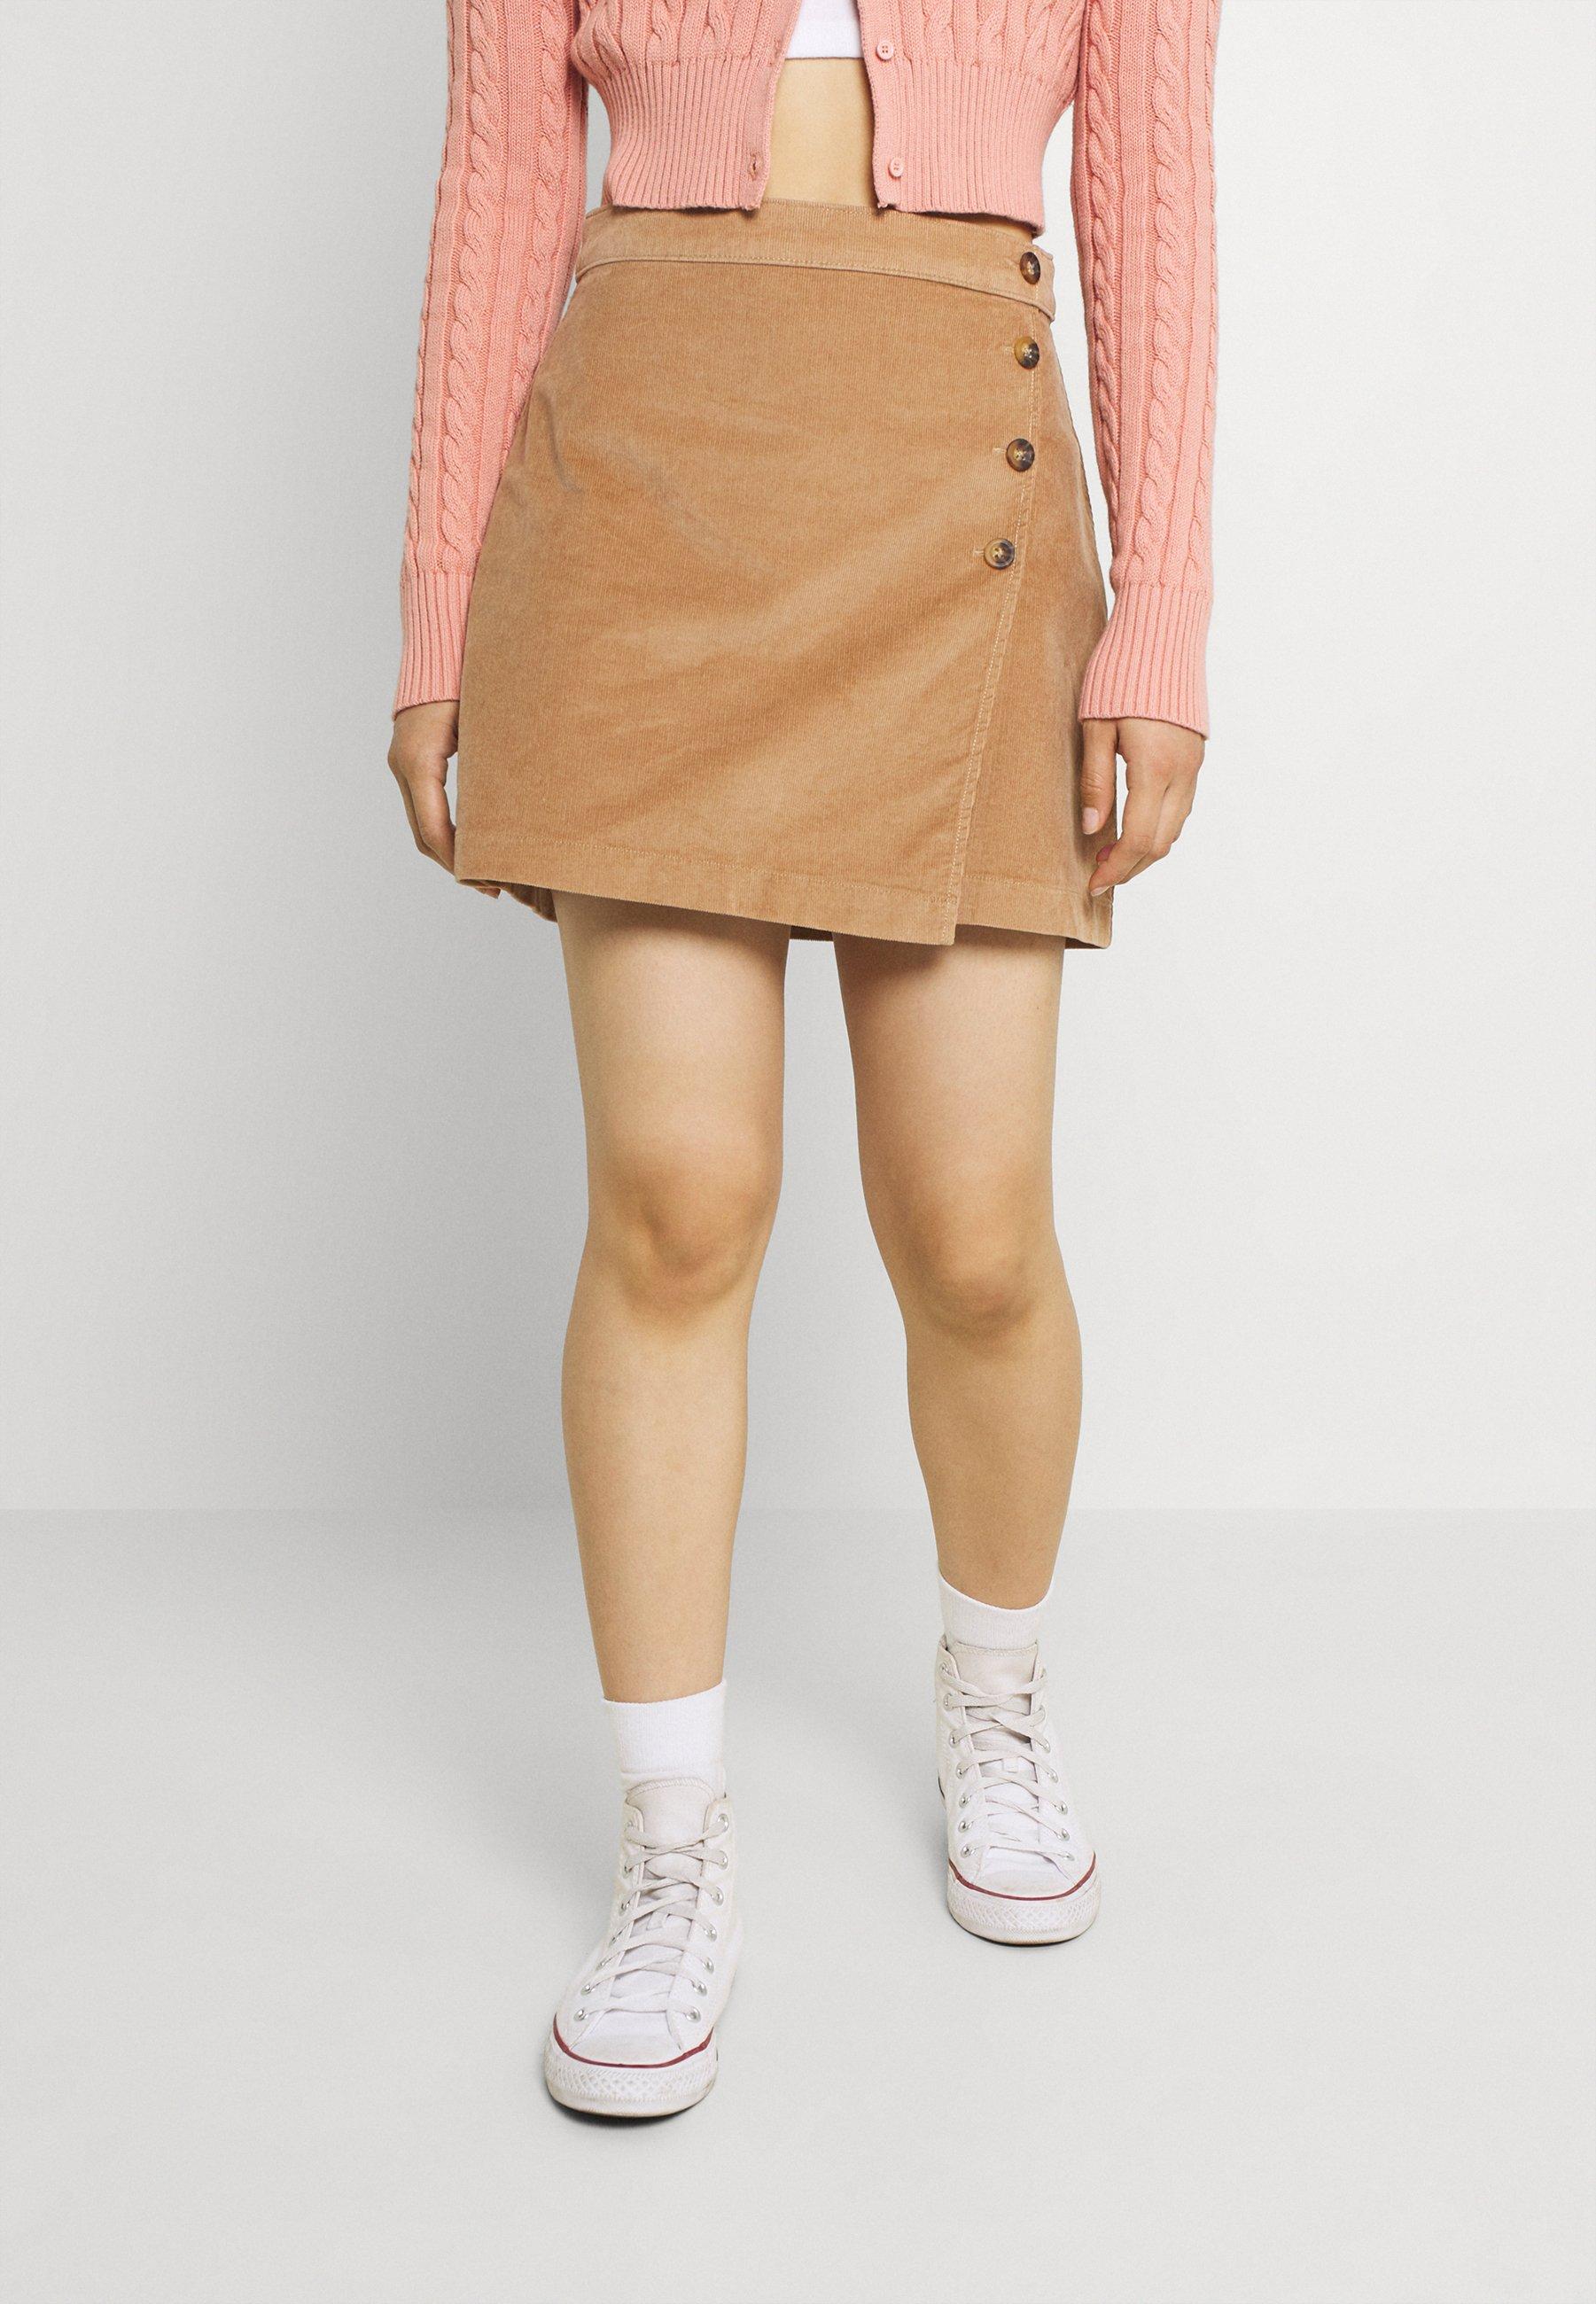 Femme WRAP SKIRT - Minijupe